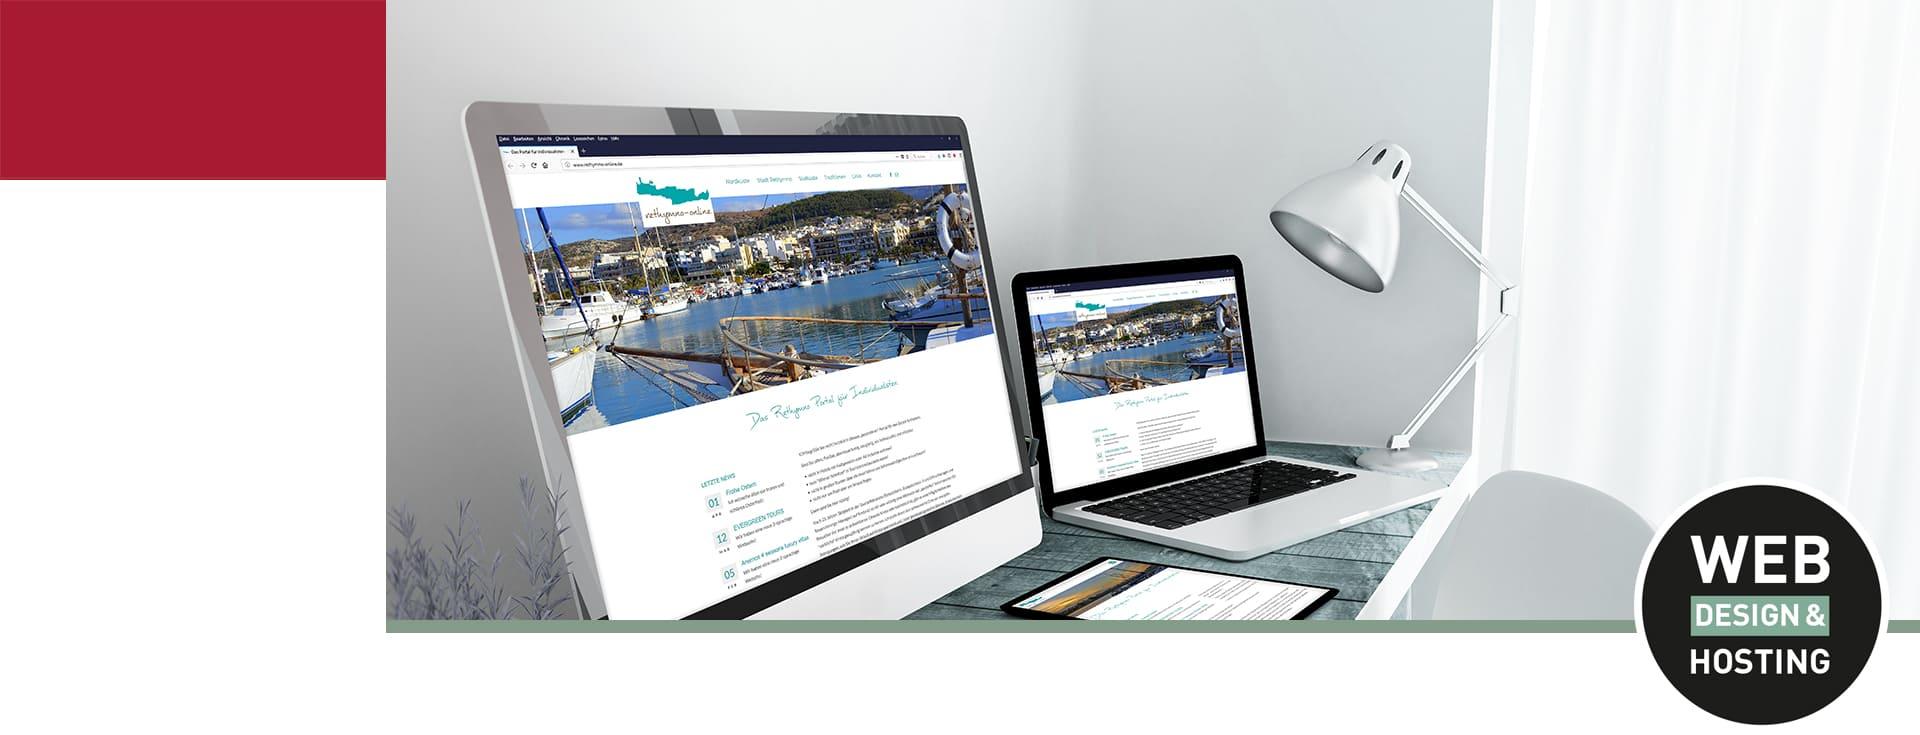 Mobiles Design für Website erstellen aof Laptop Webdesign Hannover